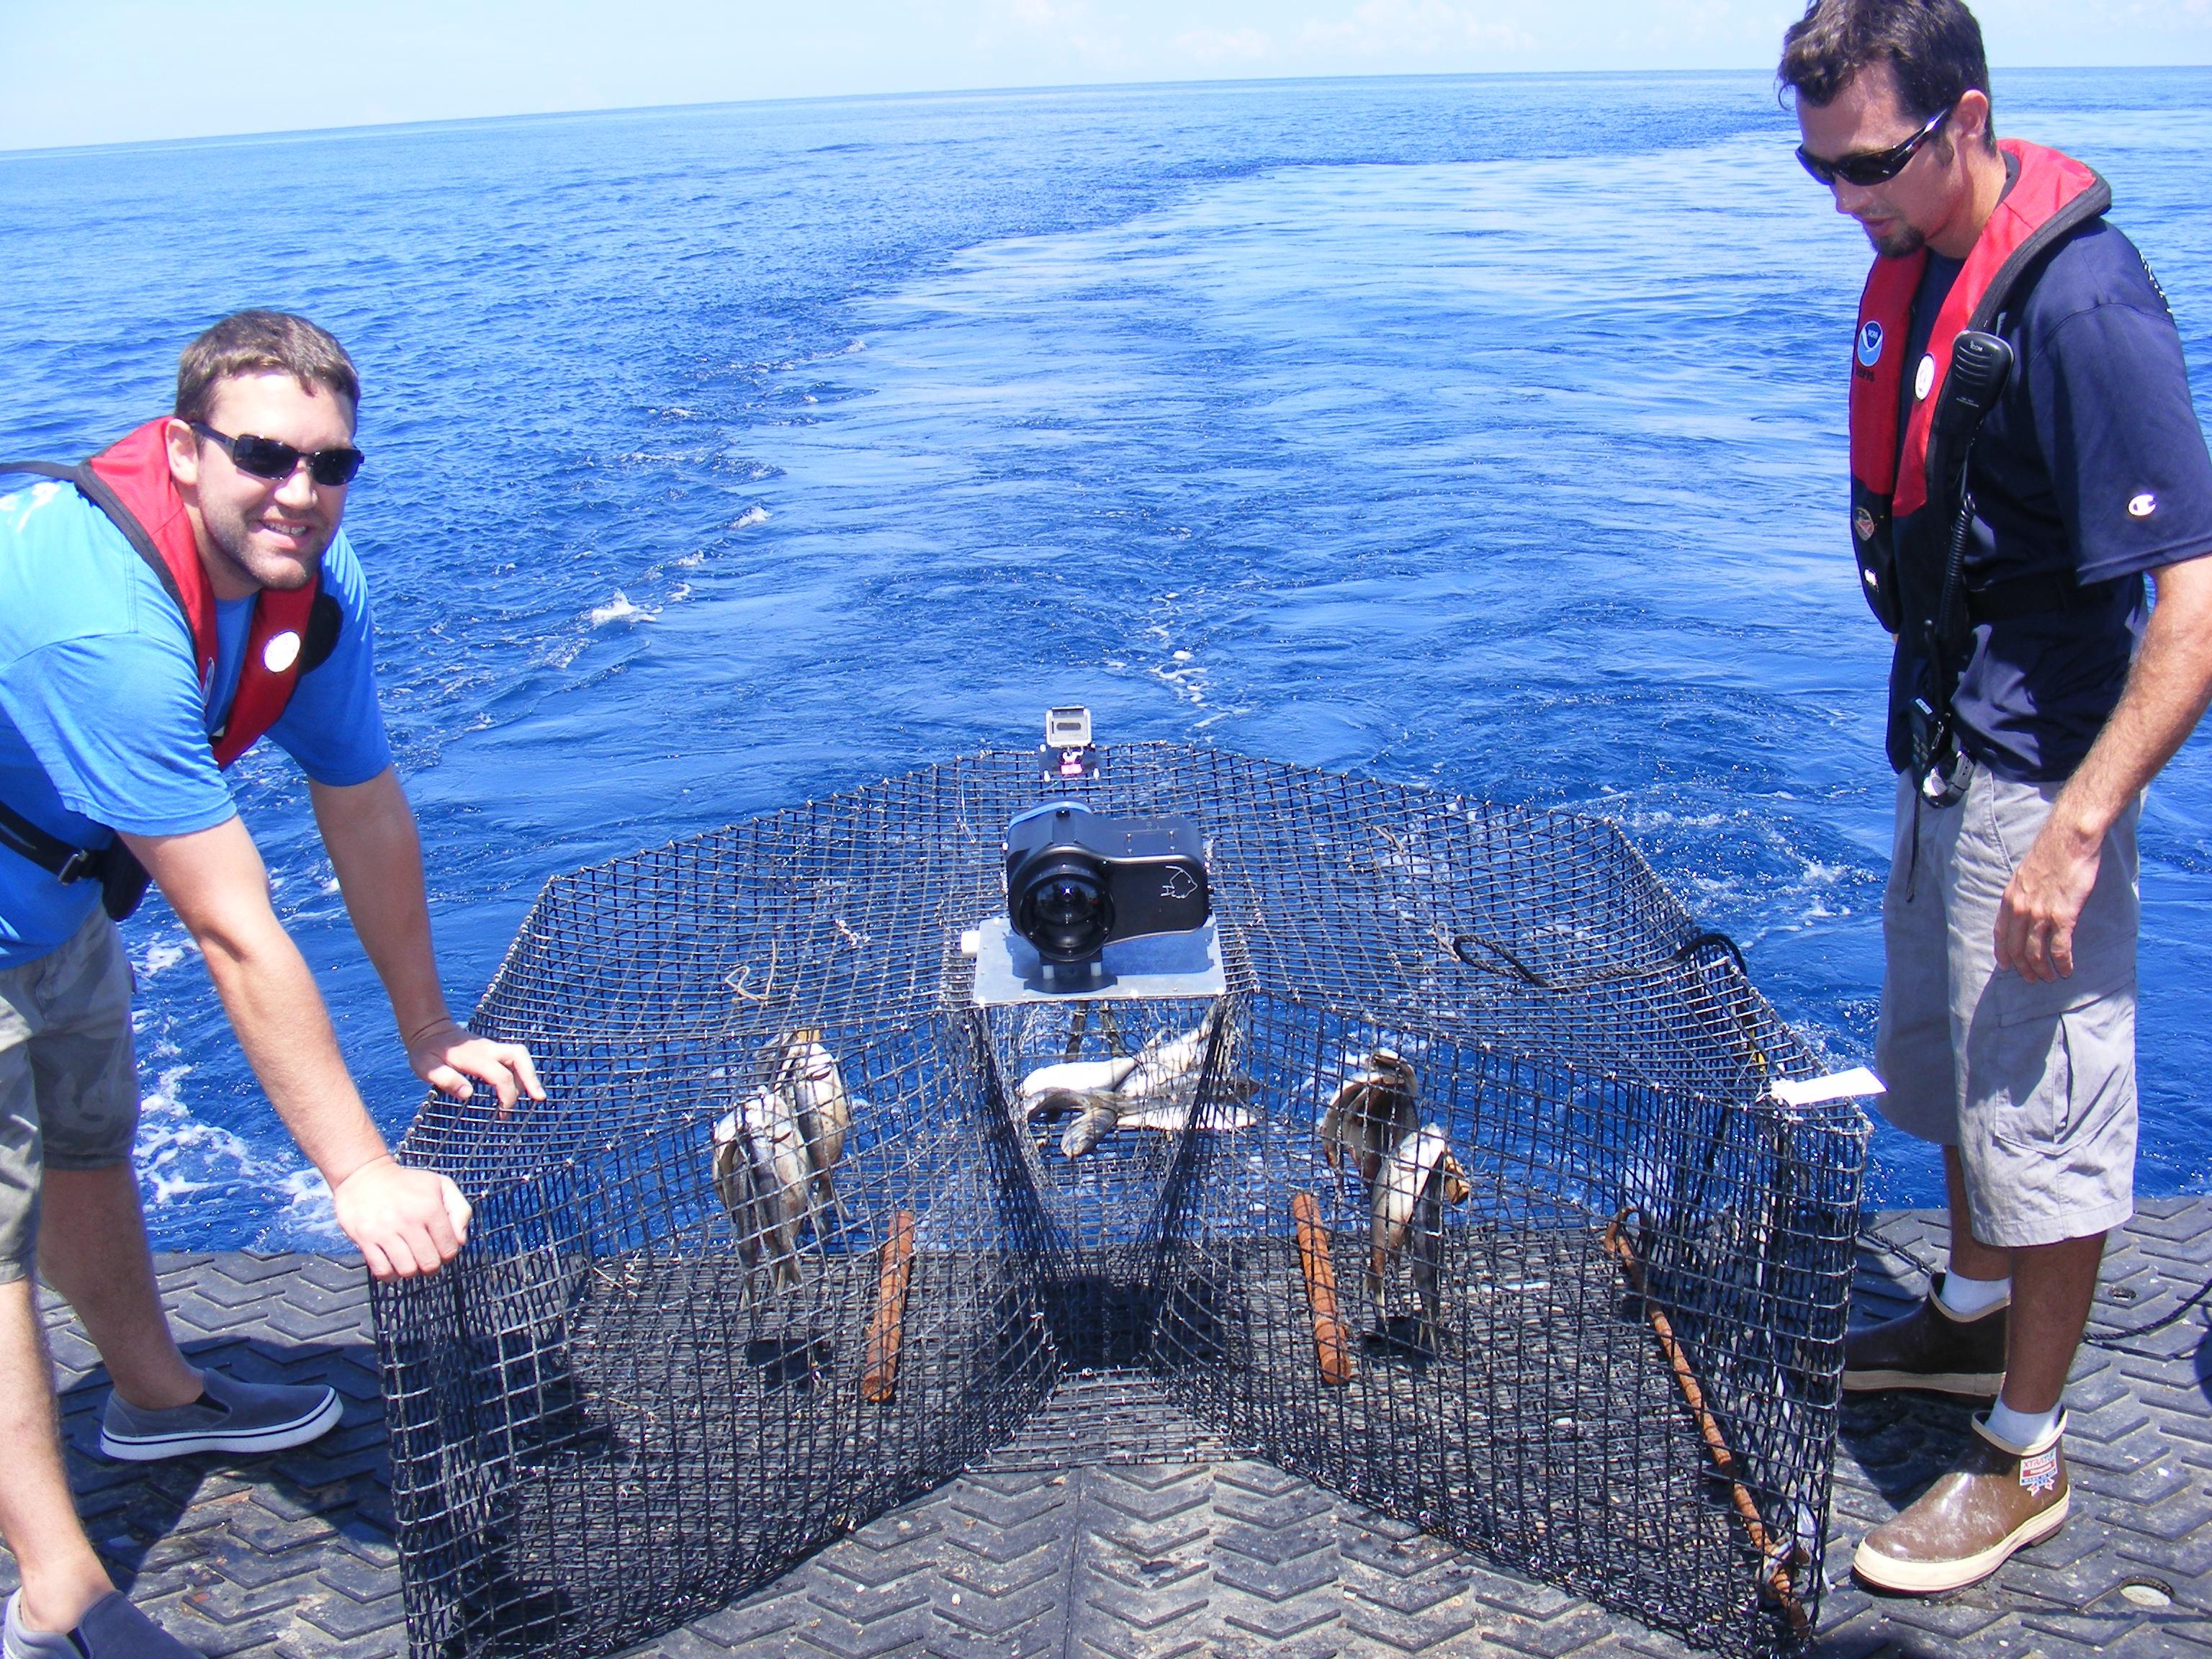 Fish traps noaa teacher at sea blog for Bait fish trap